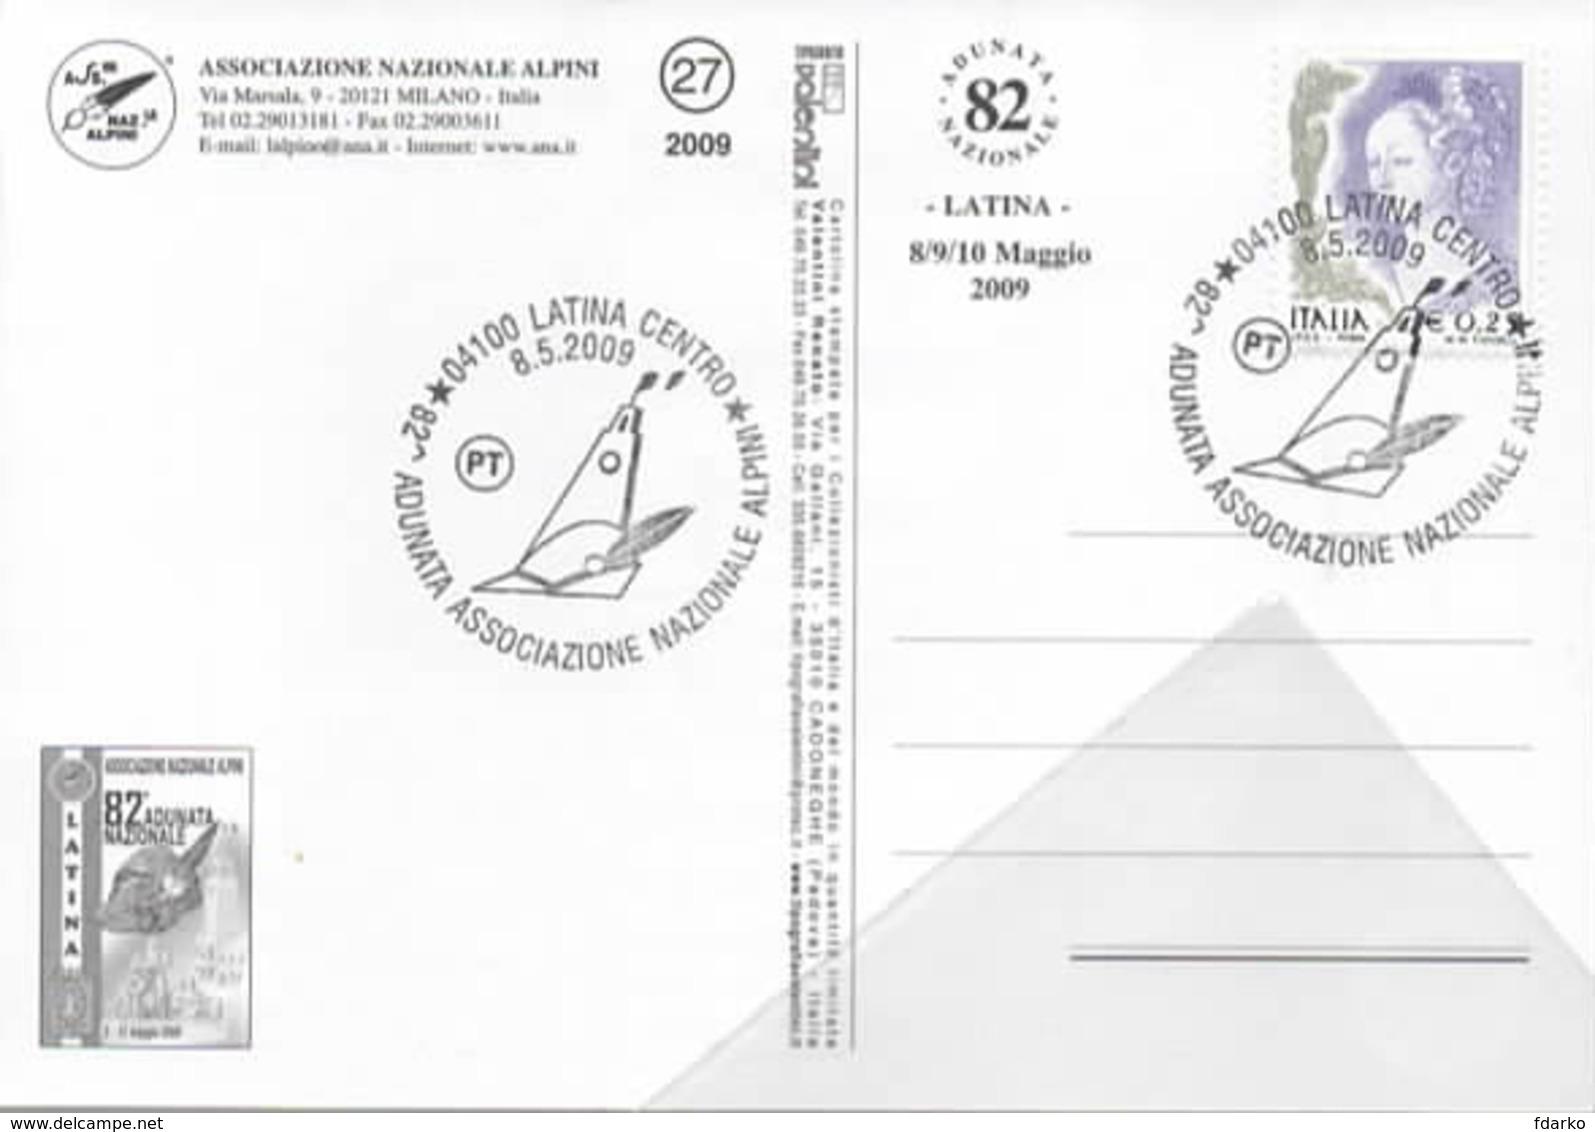 82ª Adunata Nazionale Alpini Latina Lazio 8-5-2009 ANA - Manovre